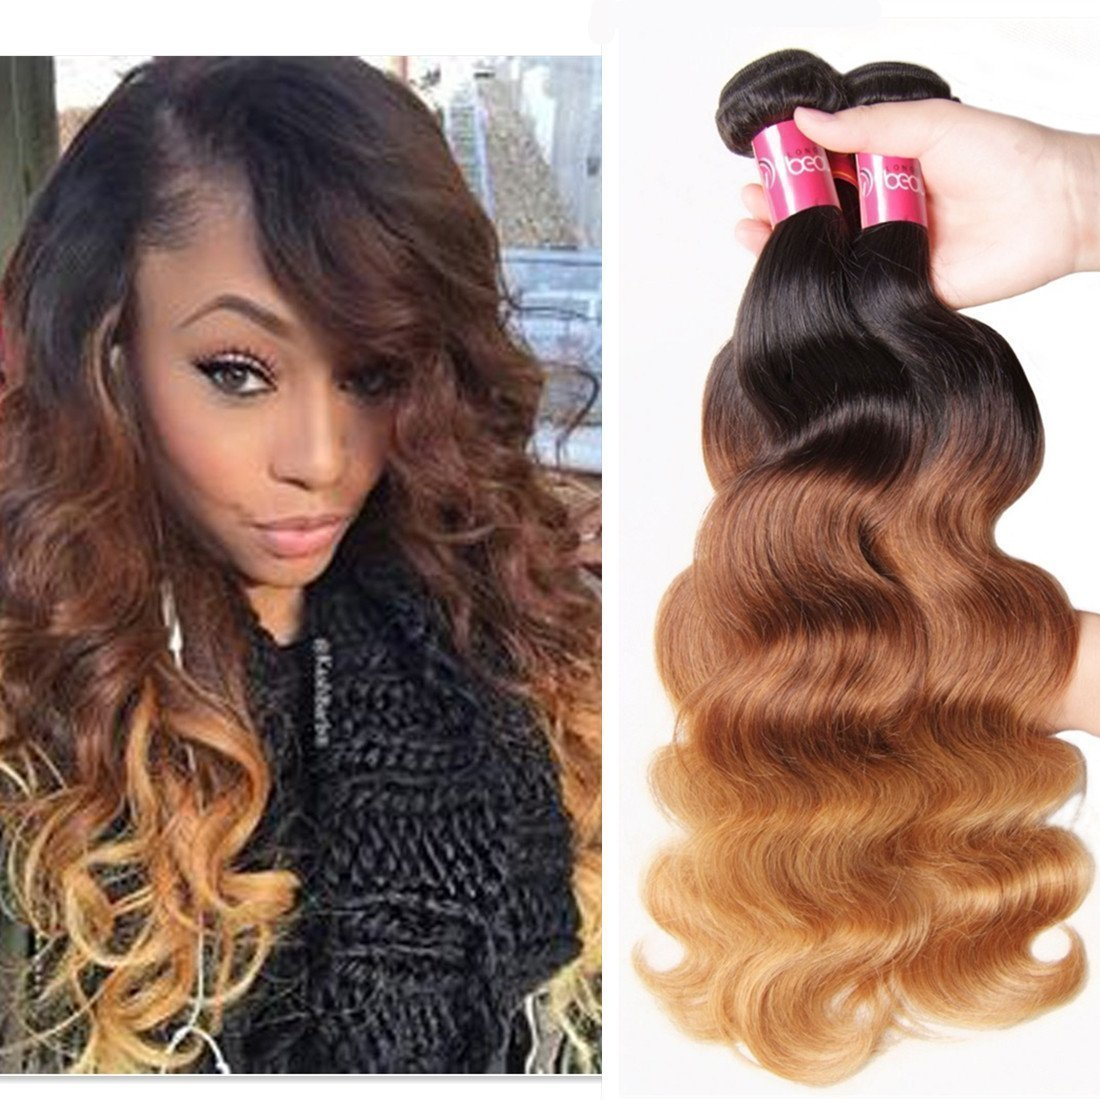 "Sunber 20""18""16"" Brazilian Hair Ombre Virgin Hair Body Wave Bundles Mixed Length 100% Human Hair Extensions #1b/4/27 Color (T1B/4/27,16 18 20)"